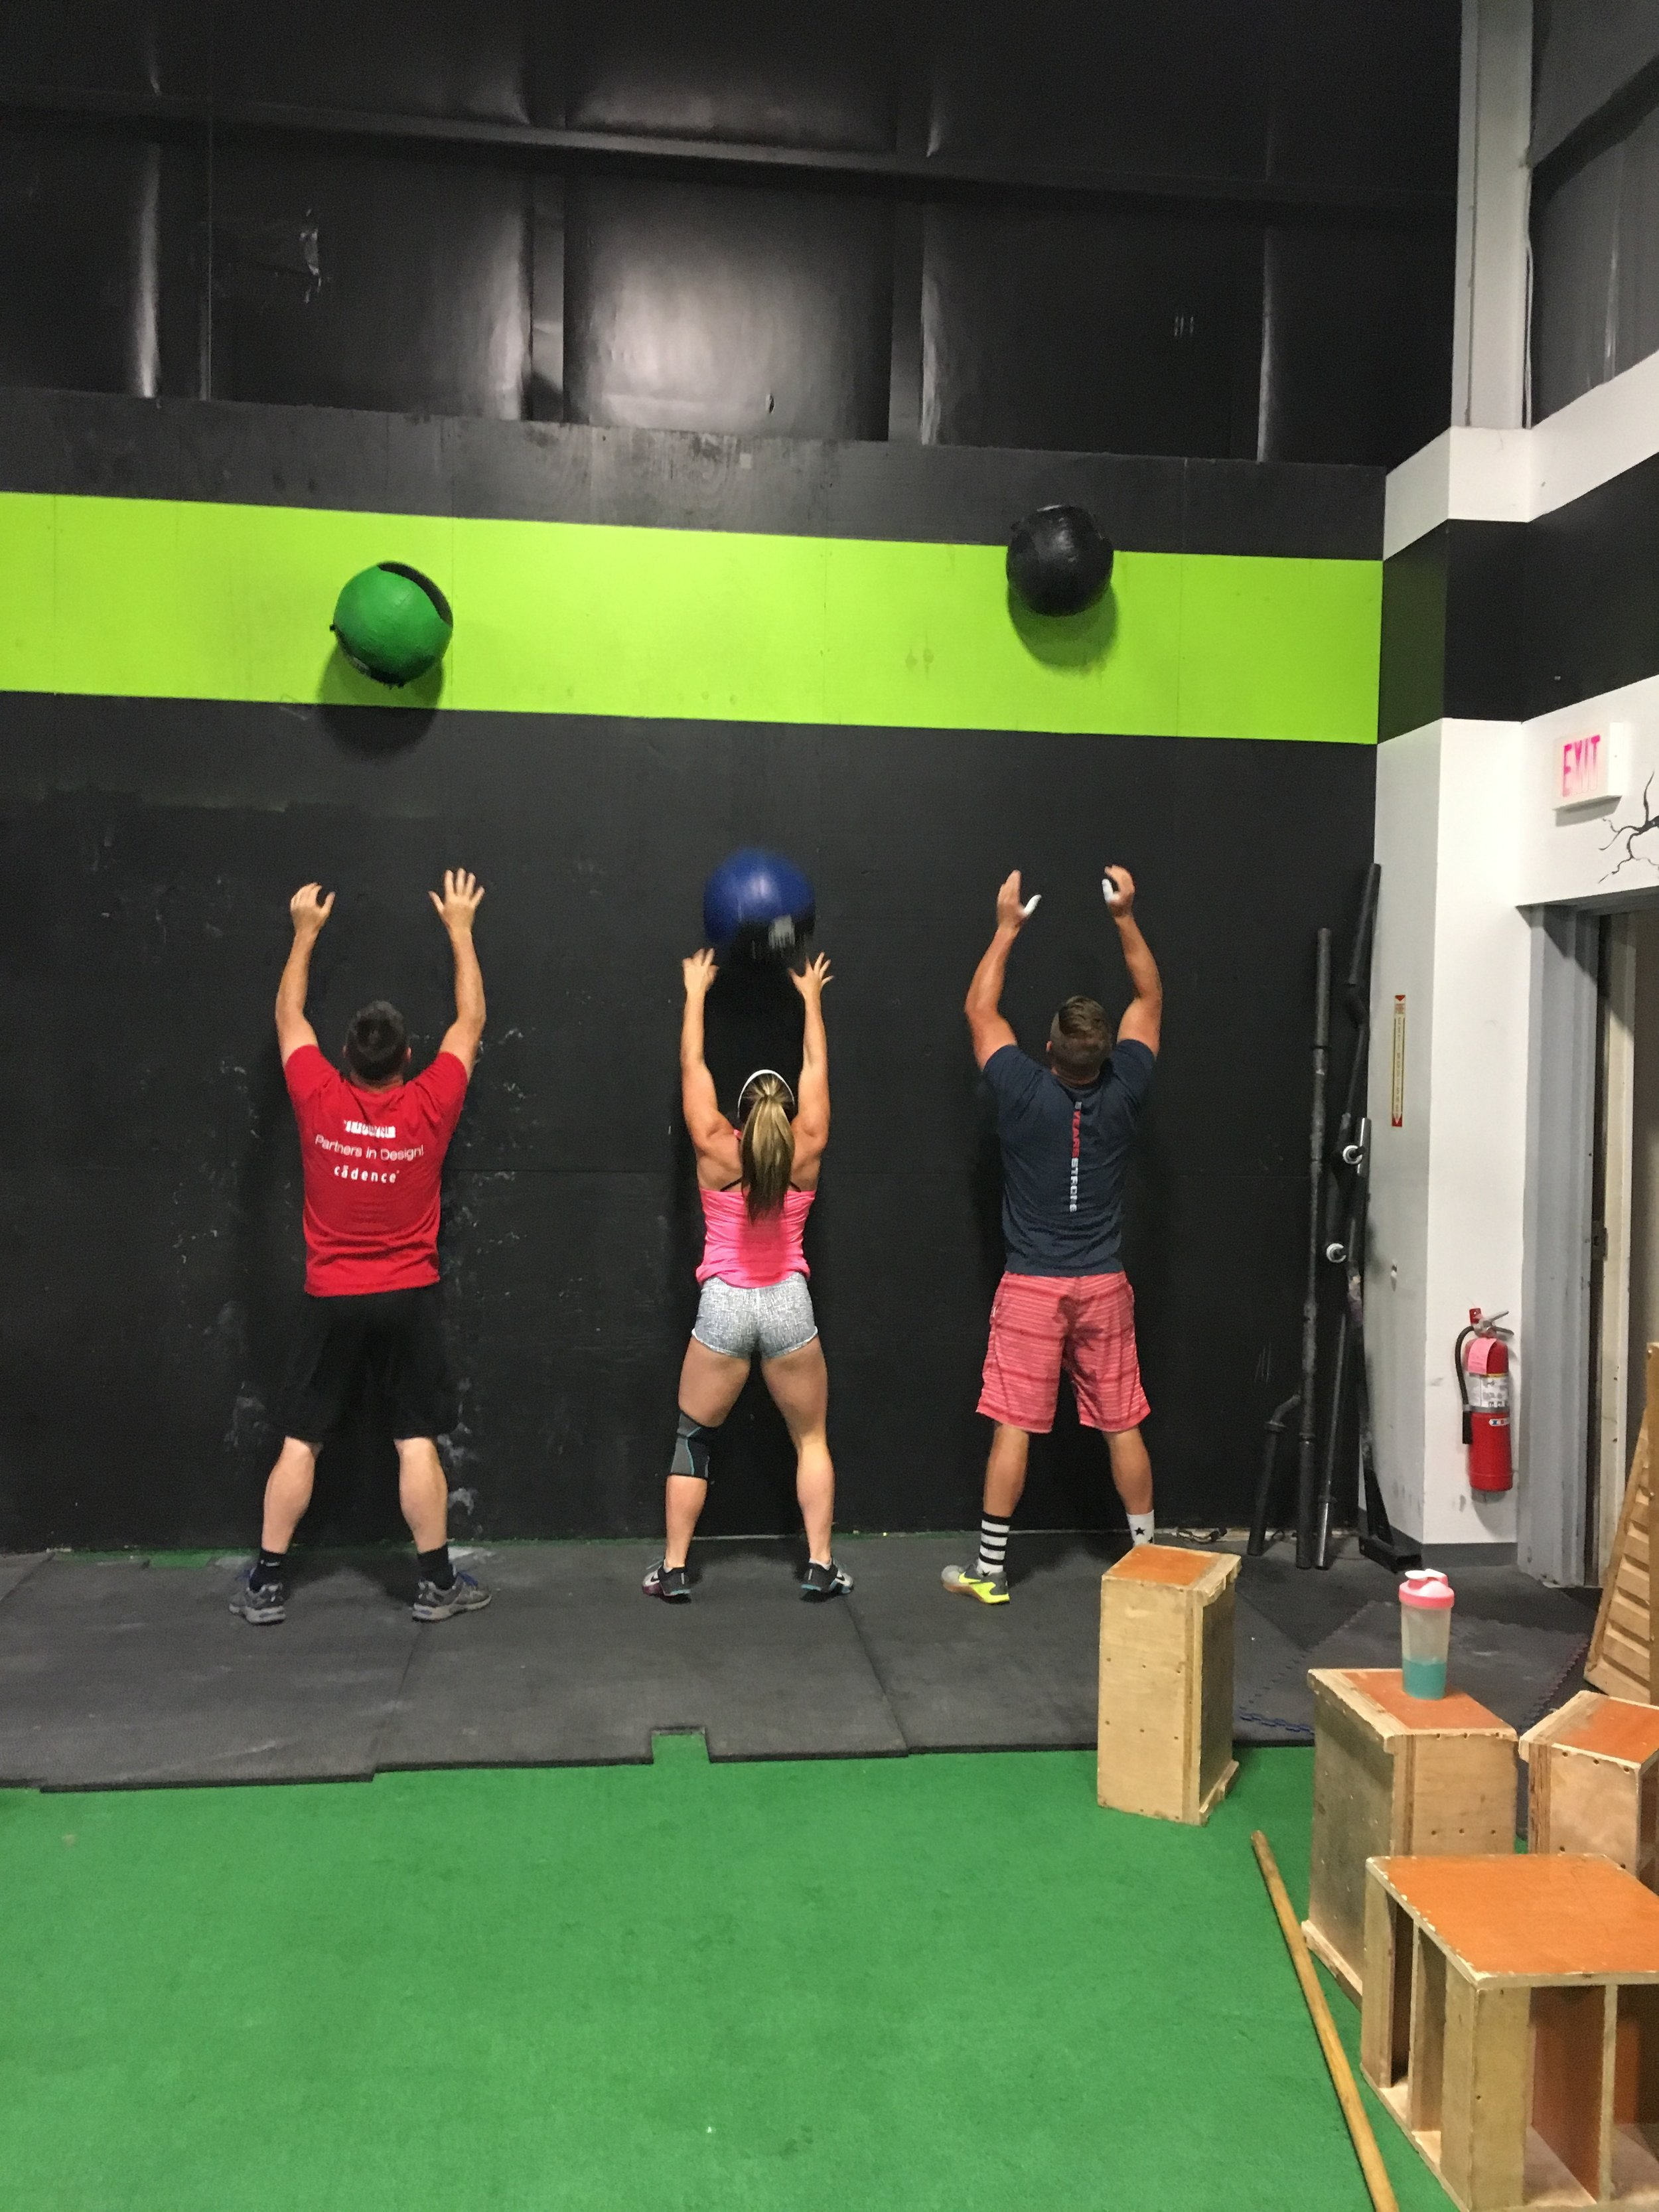 Three McGrath's slinging Wall Balls! ;)